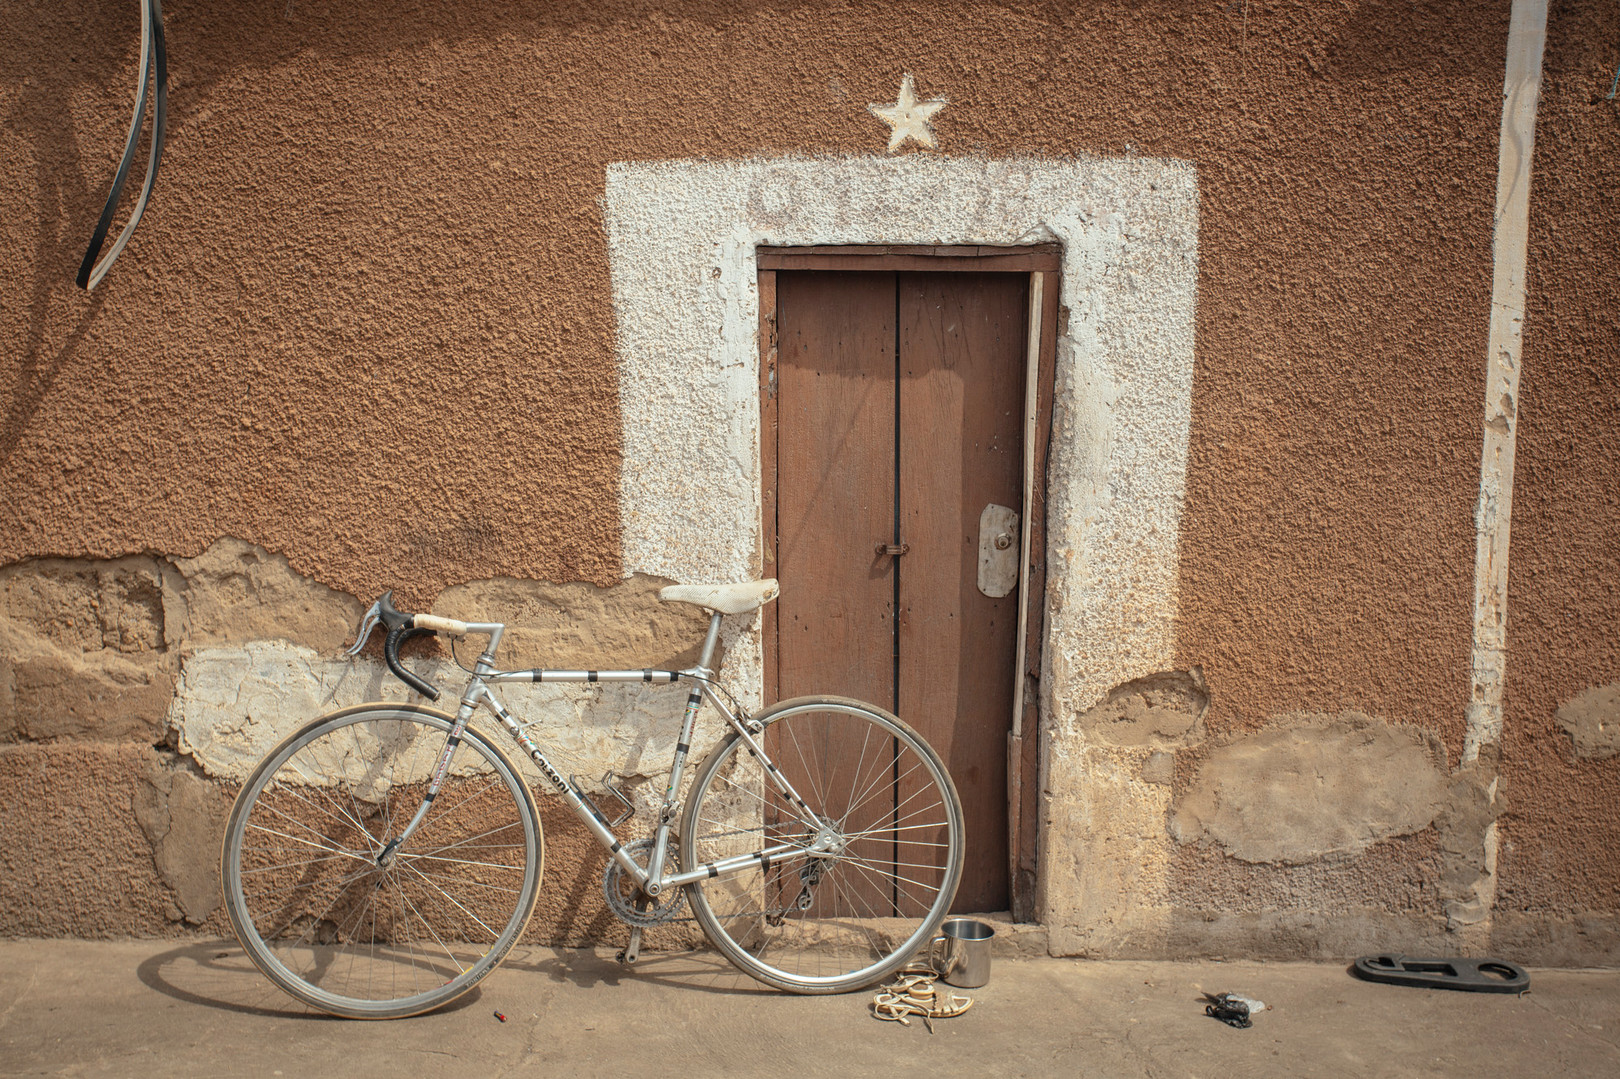 0202_Togo_KpaliméCyclingProject_20151220